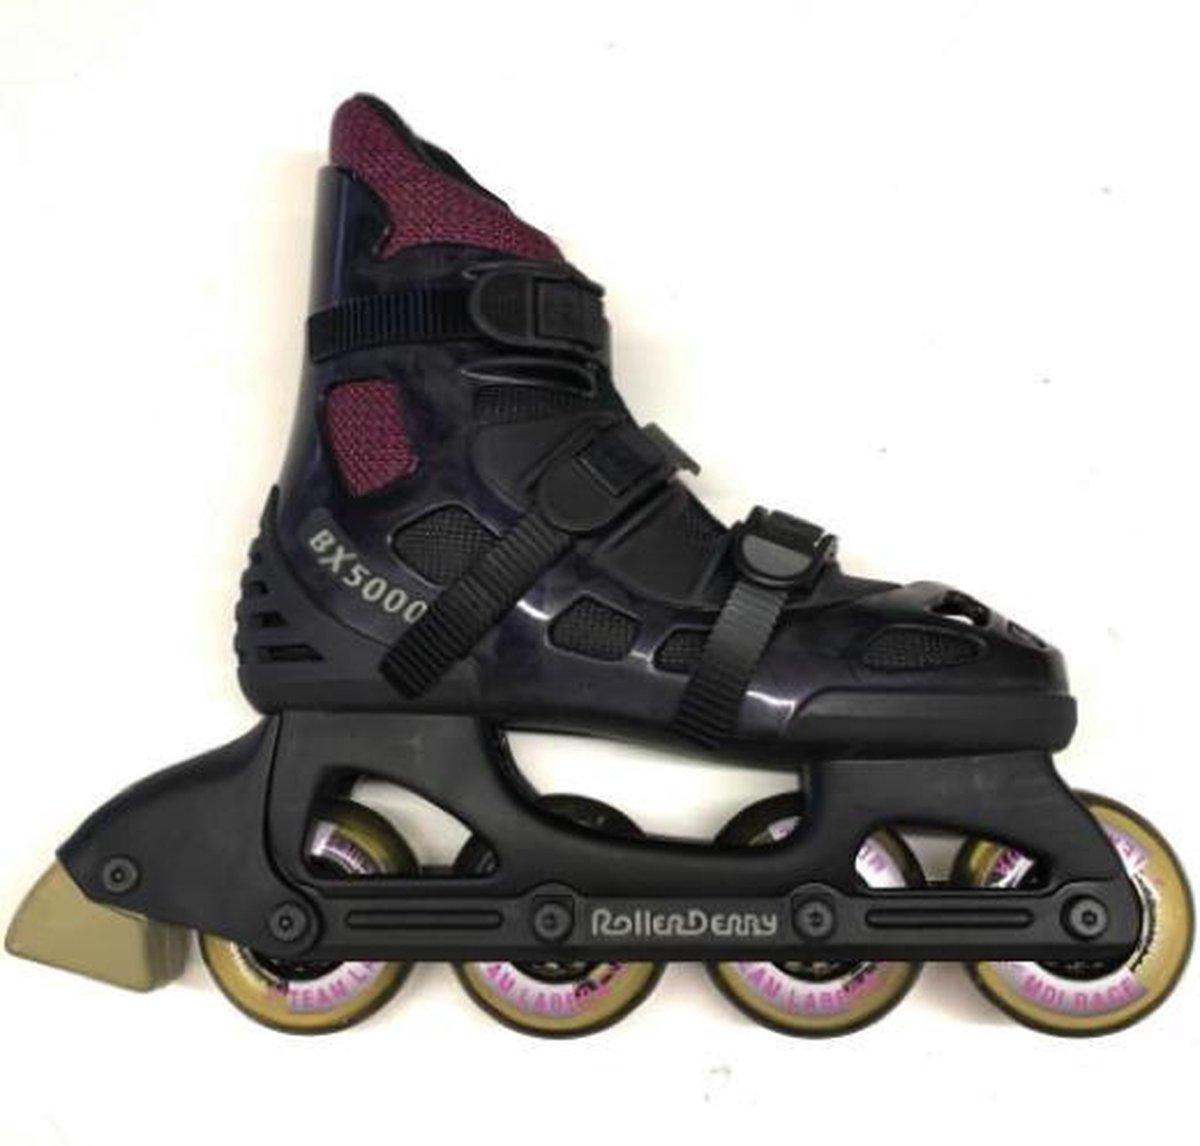 ROLLER DERBY BX5000 Inline Skates Heren - Maat US 9